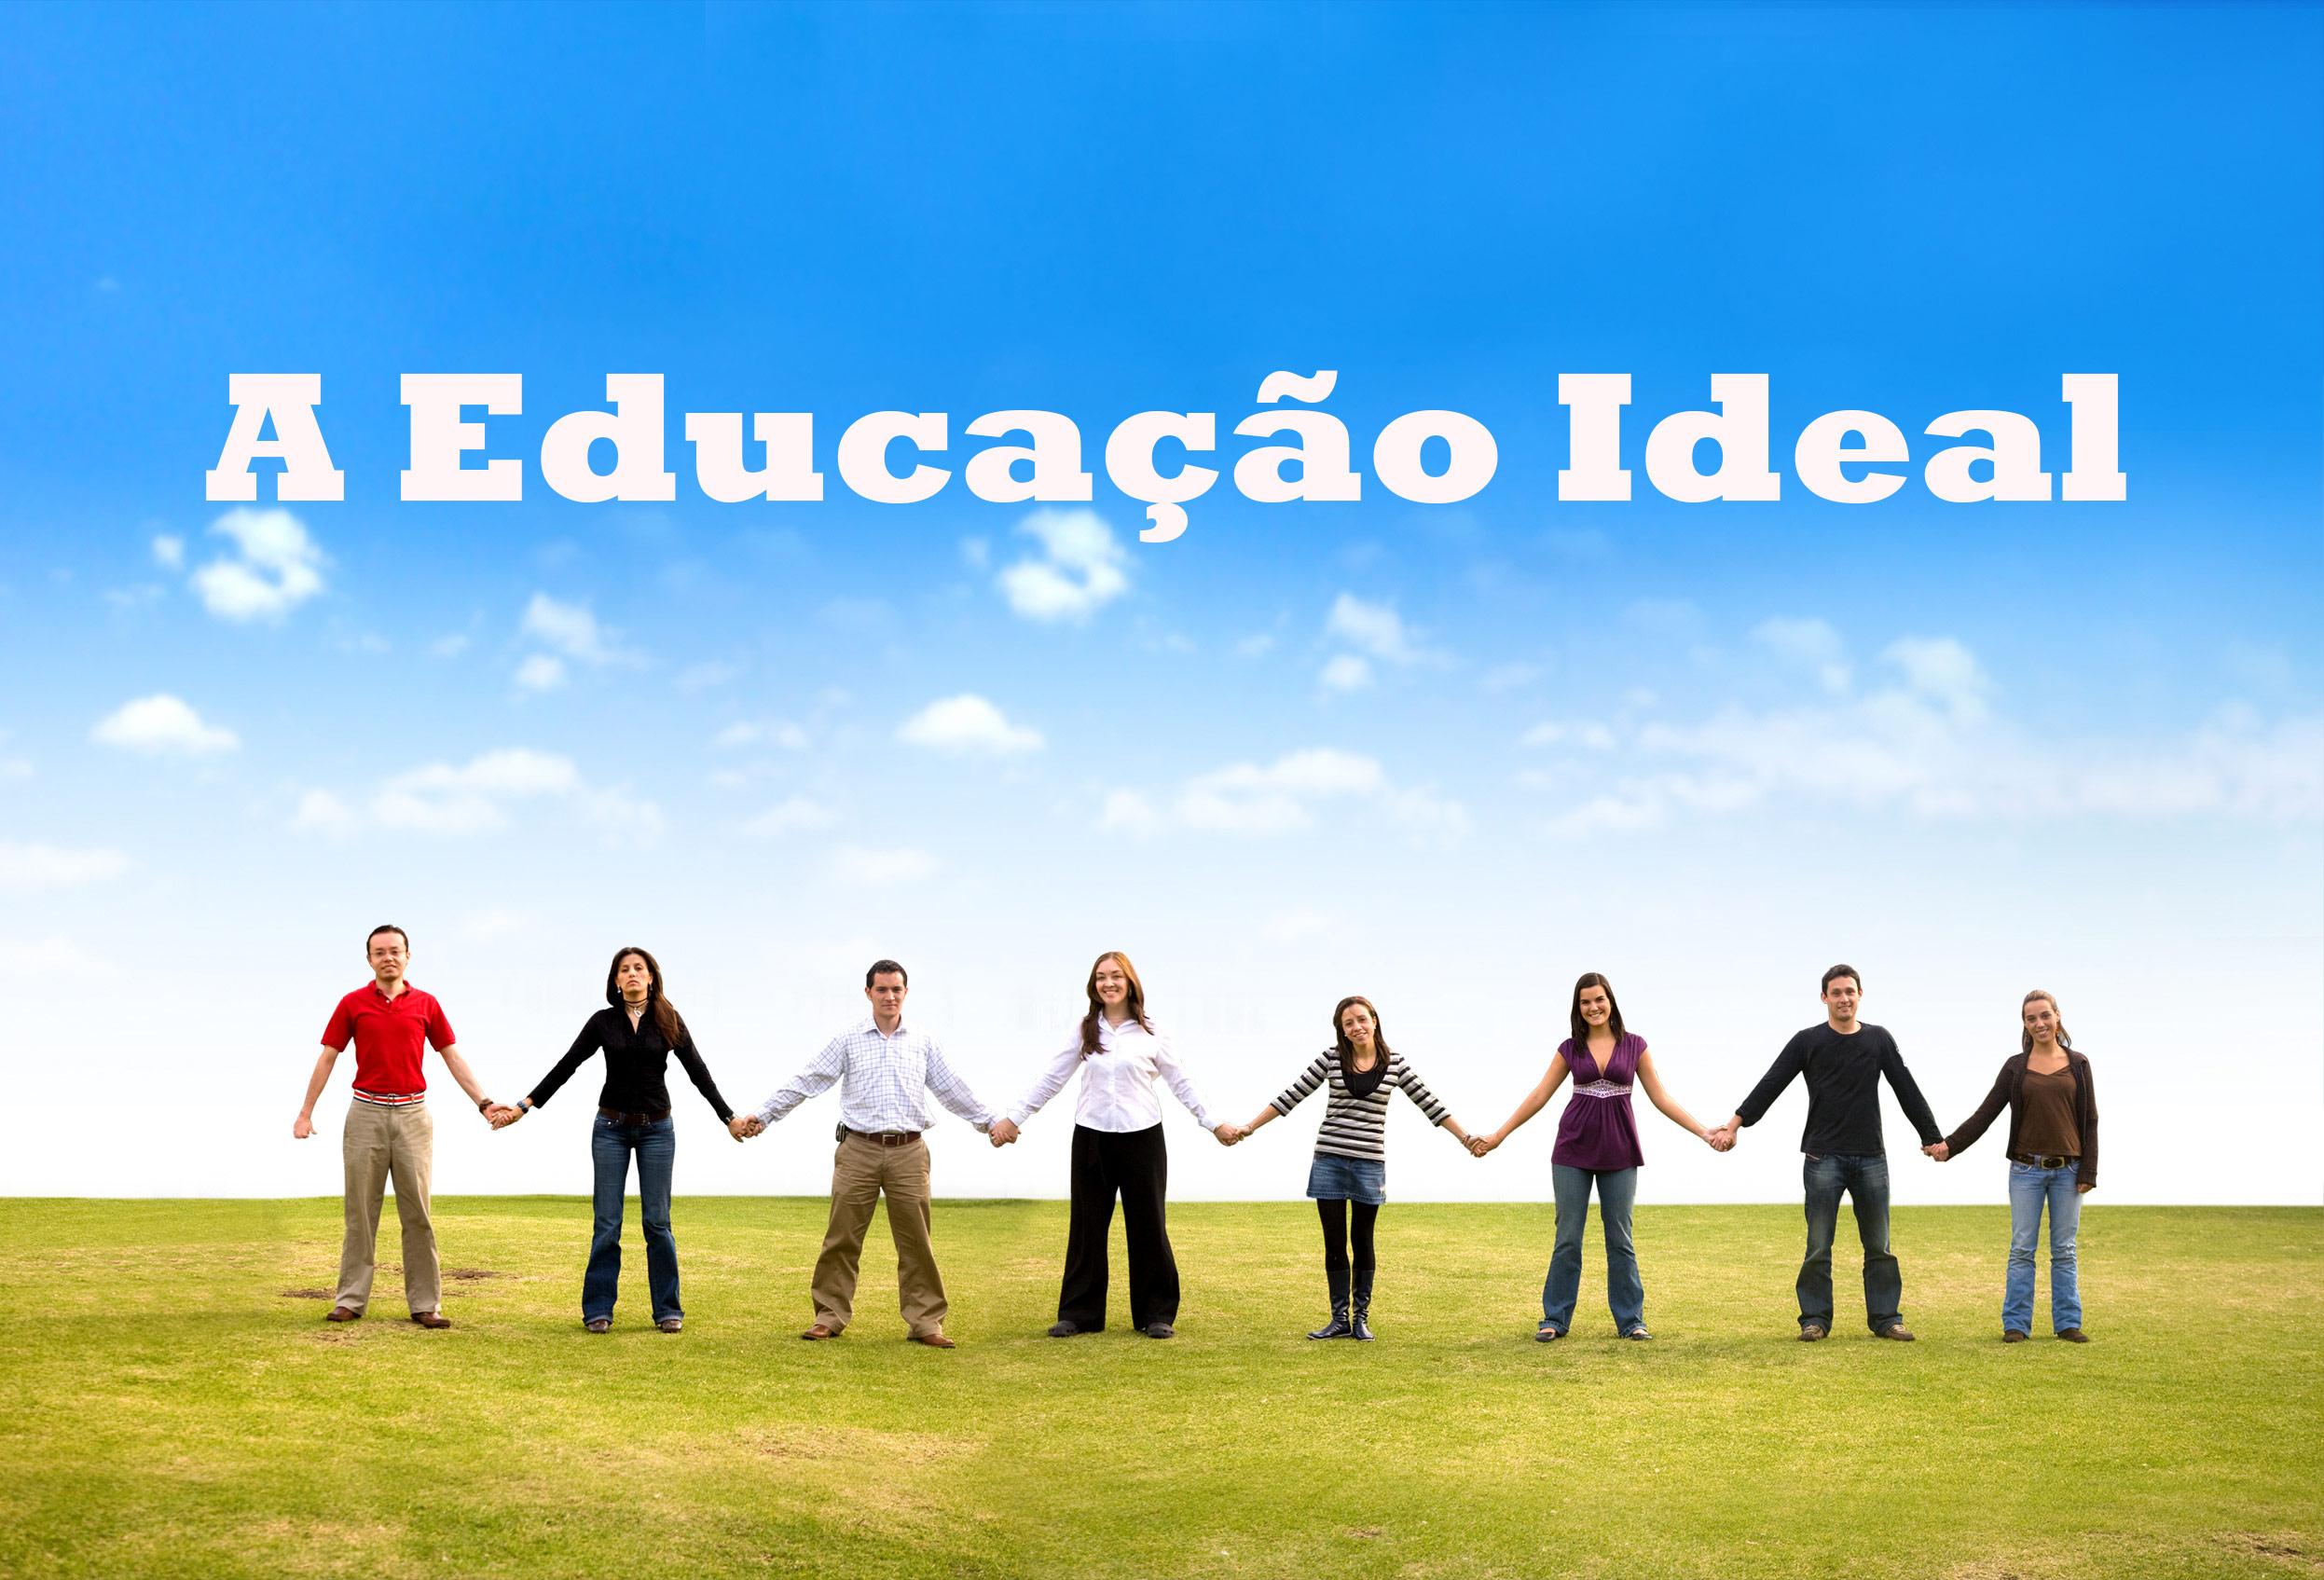 educacao-ideal